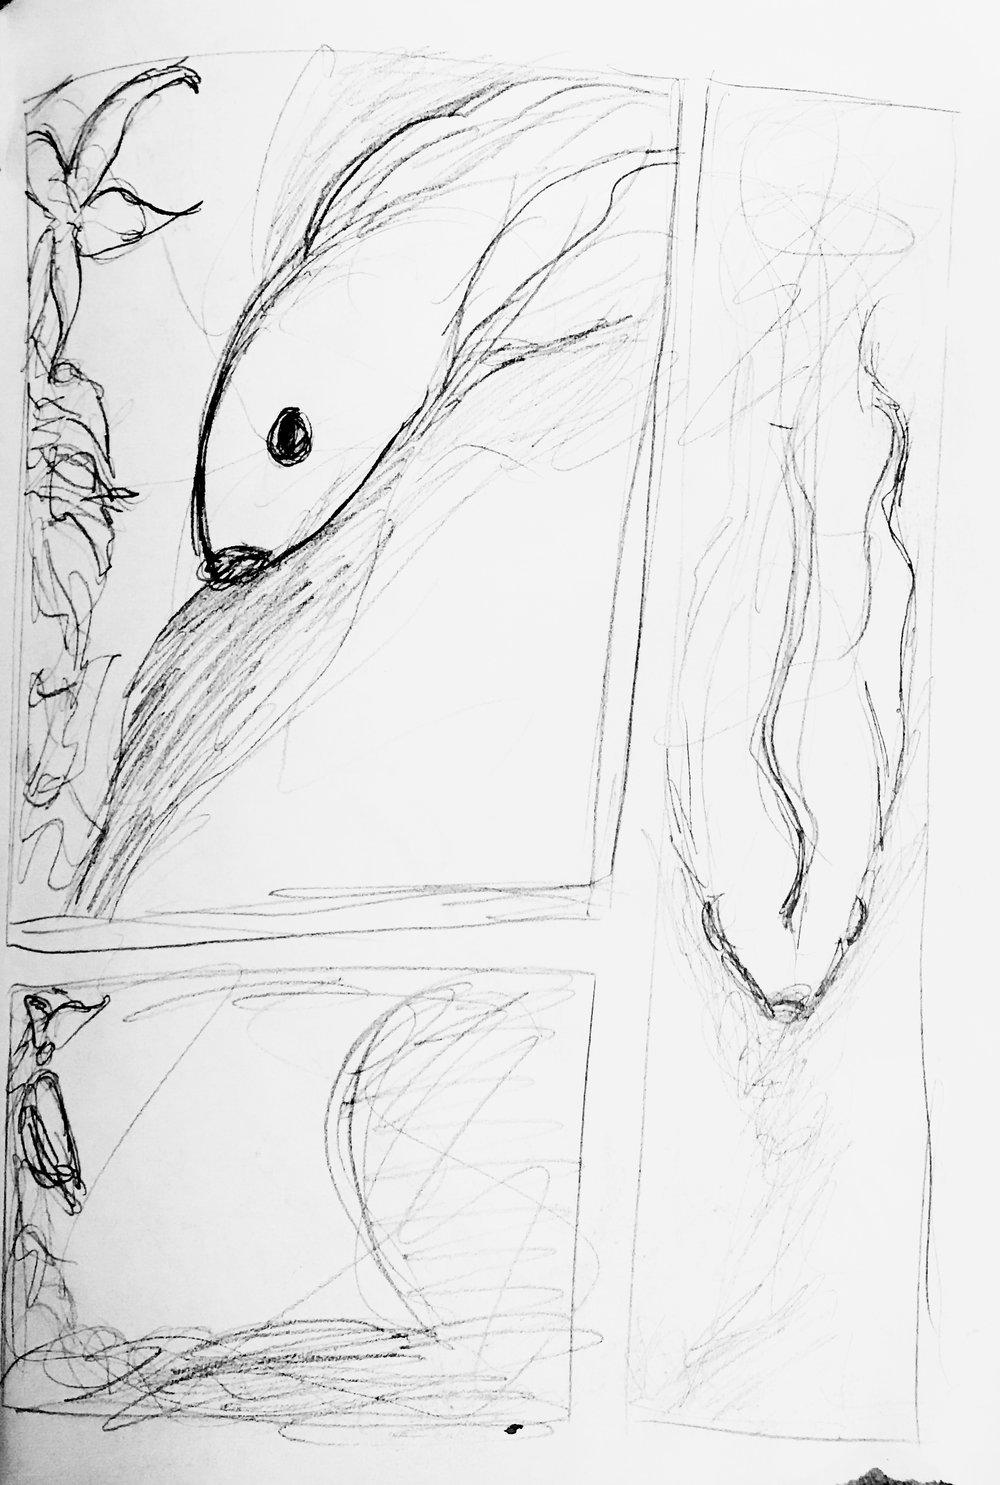 Sketch-Seascape-14.jpg